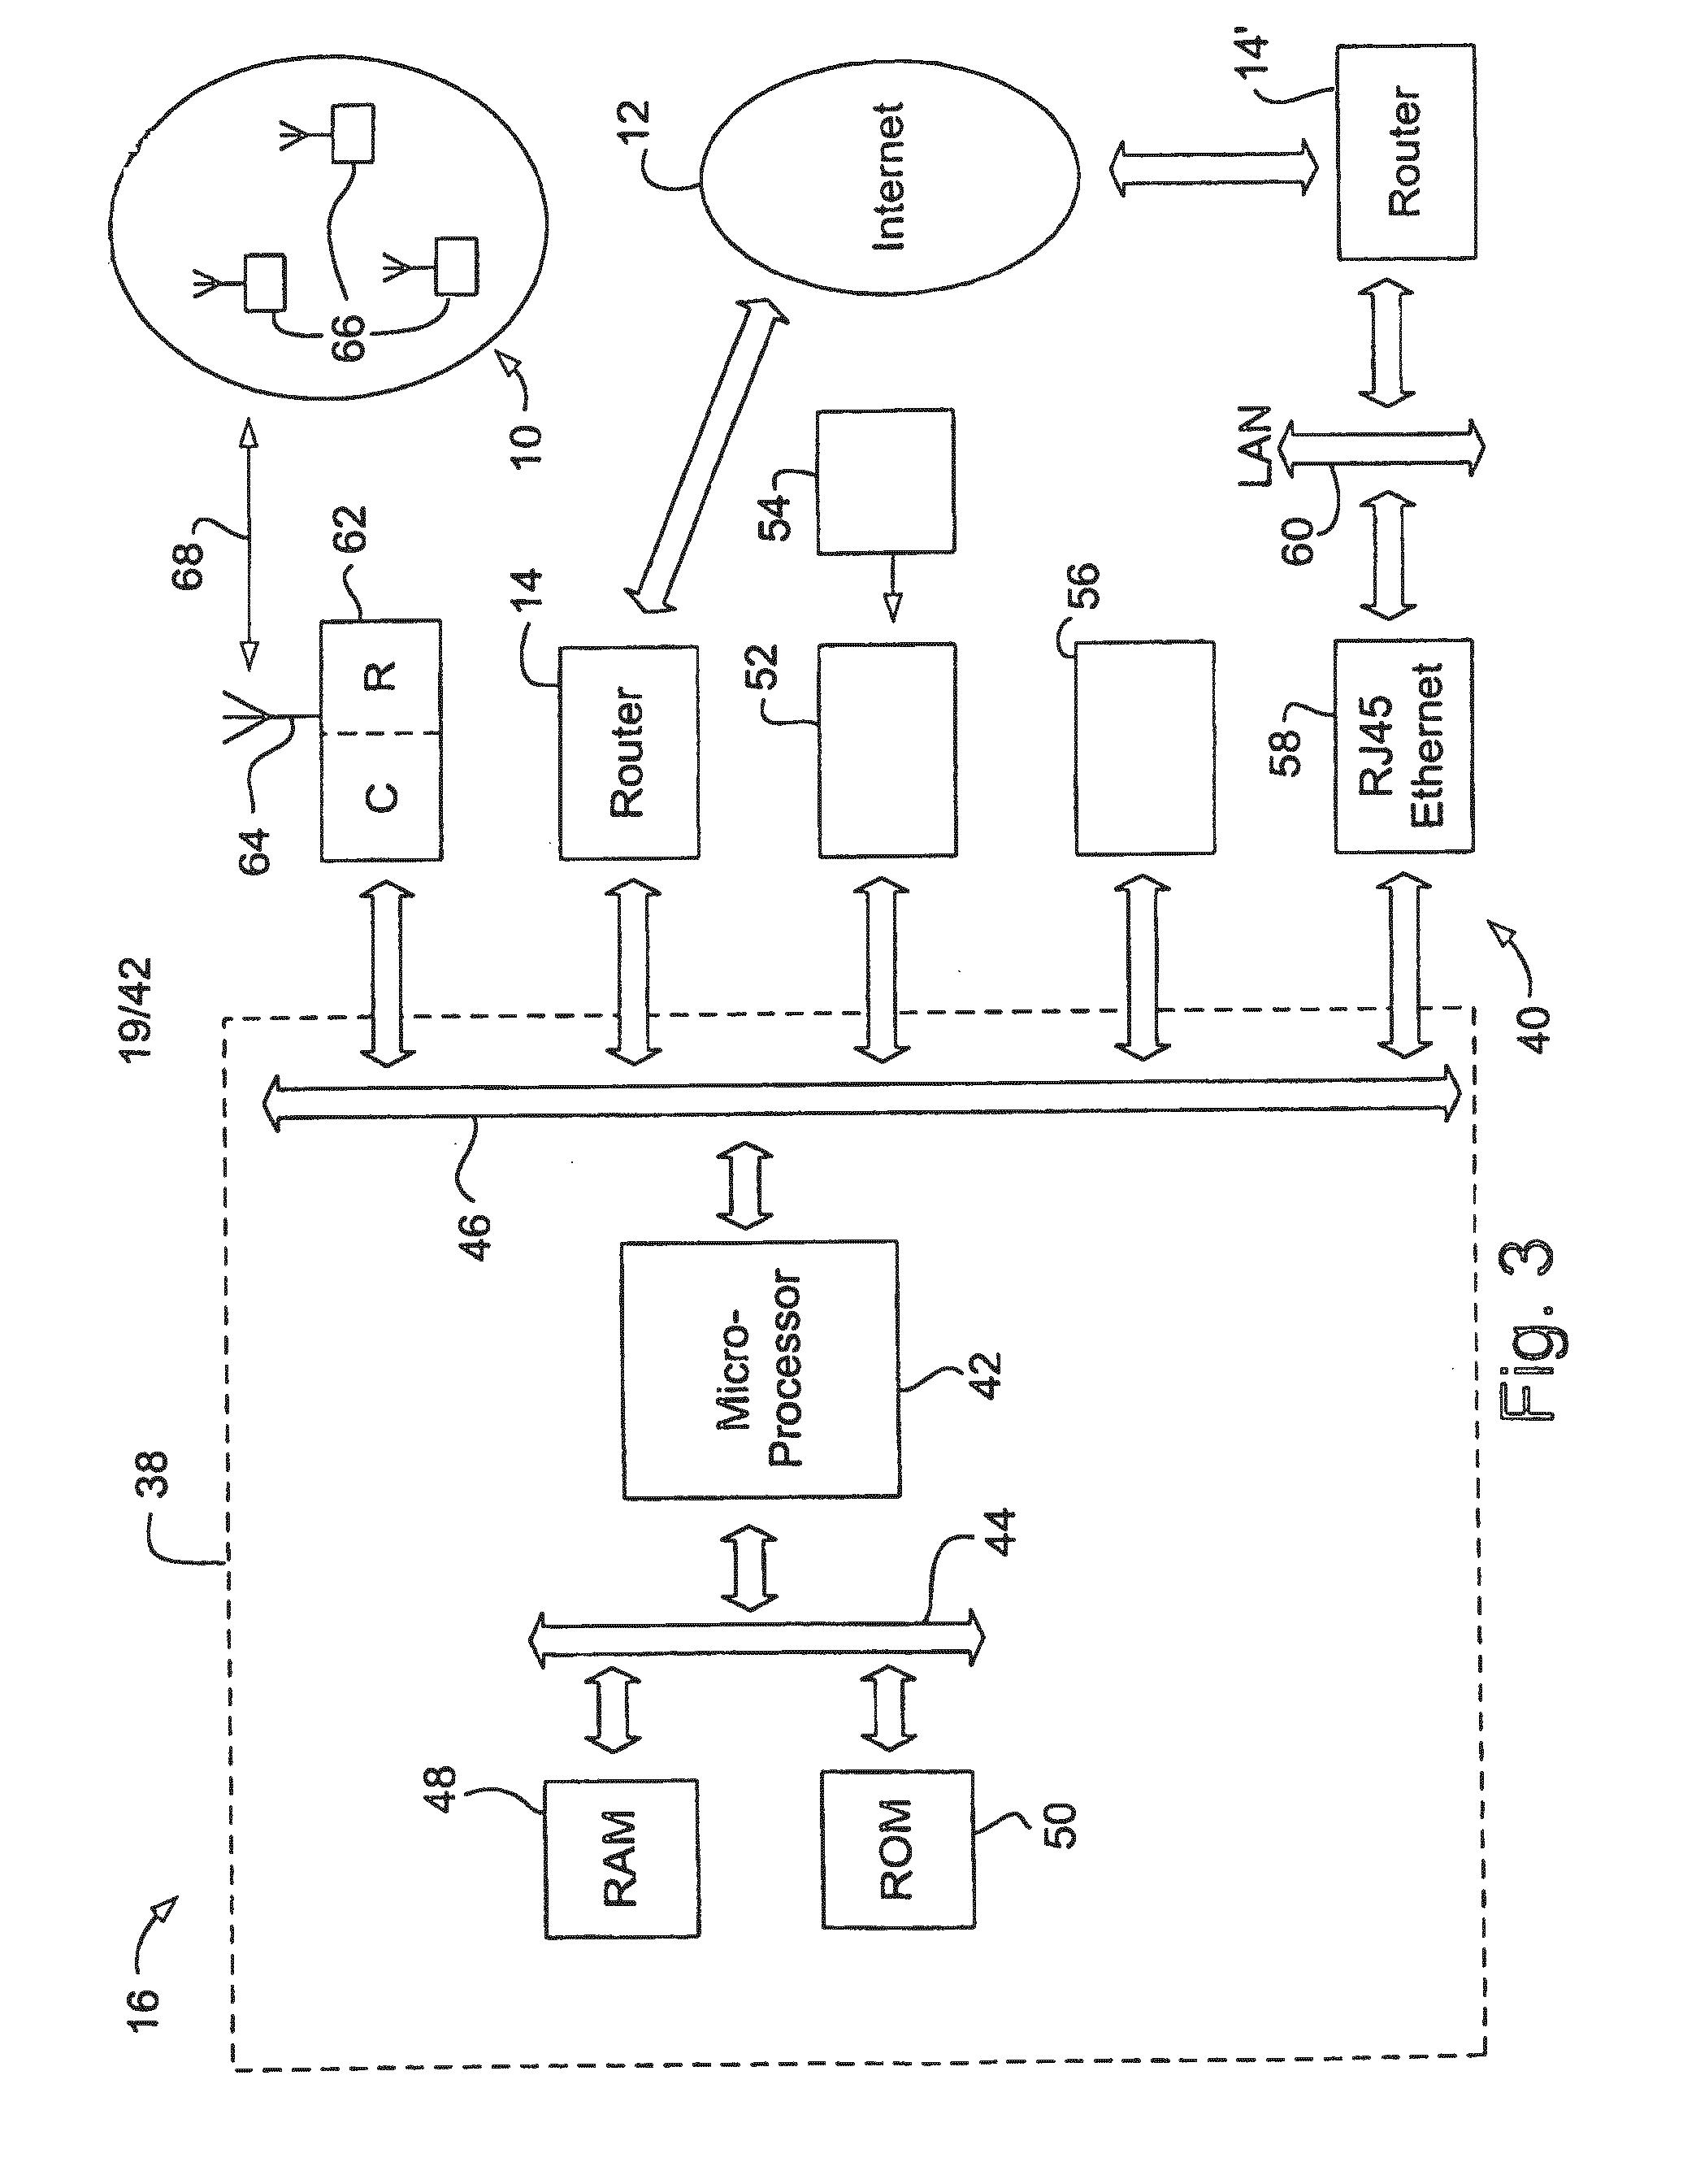 belize spas wiring diagram vita spa diagram wiring diagram